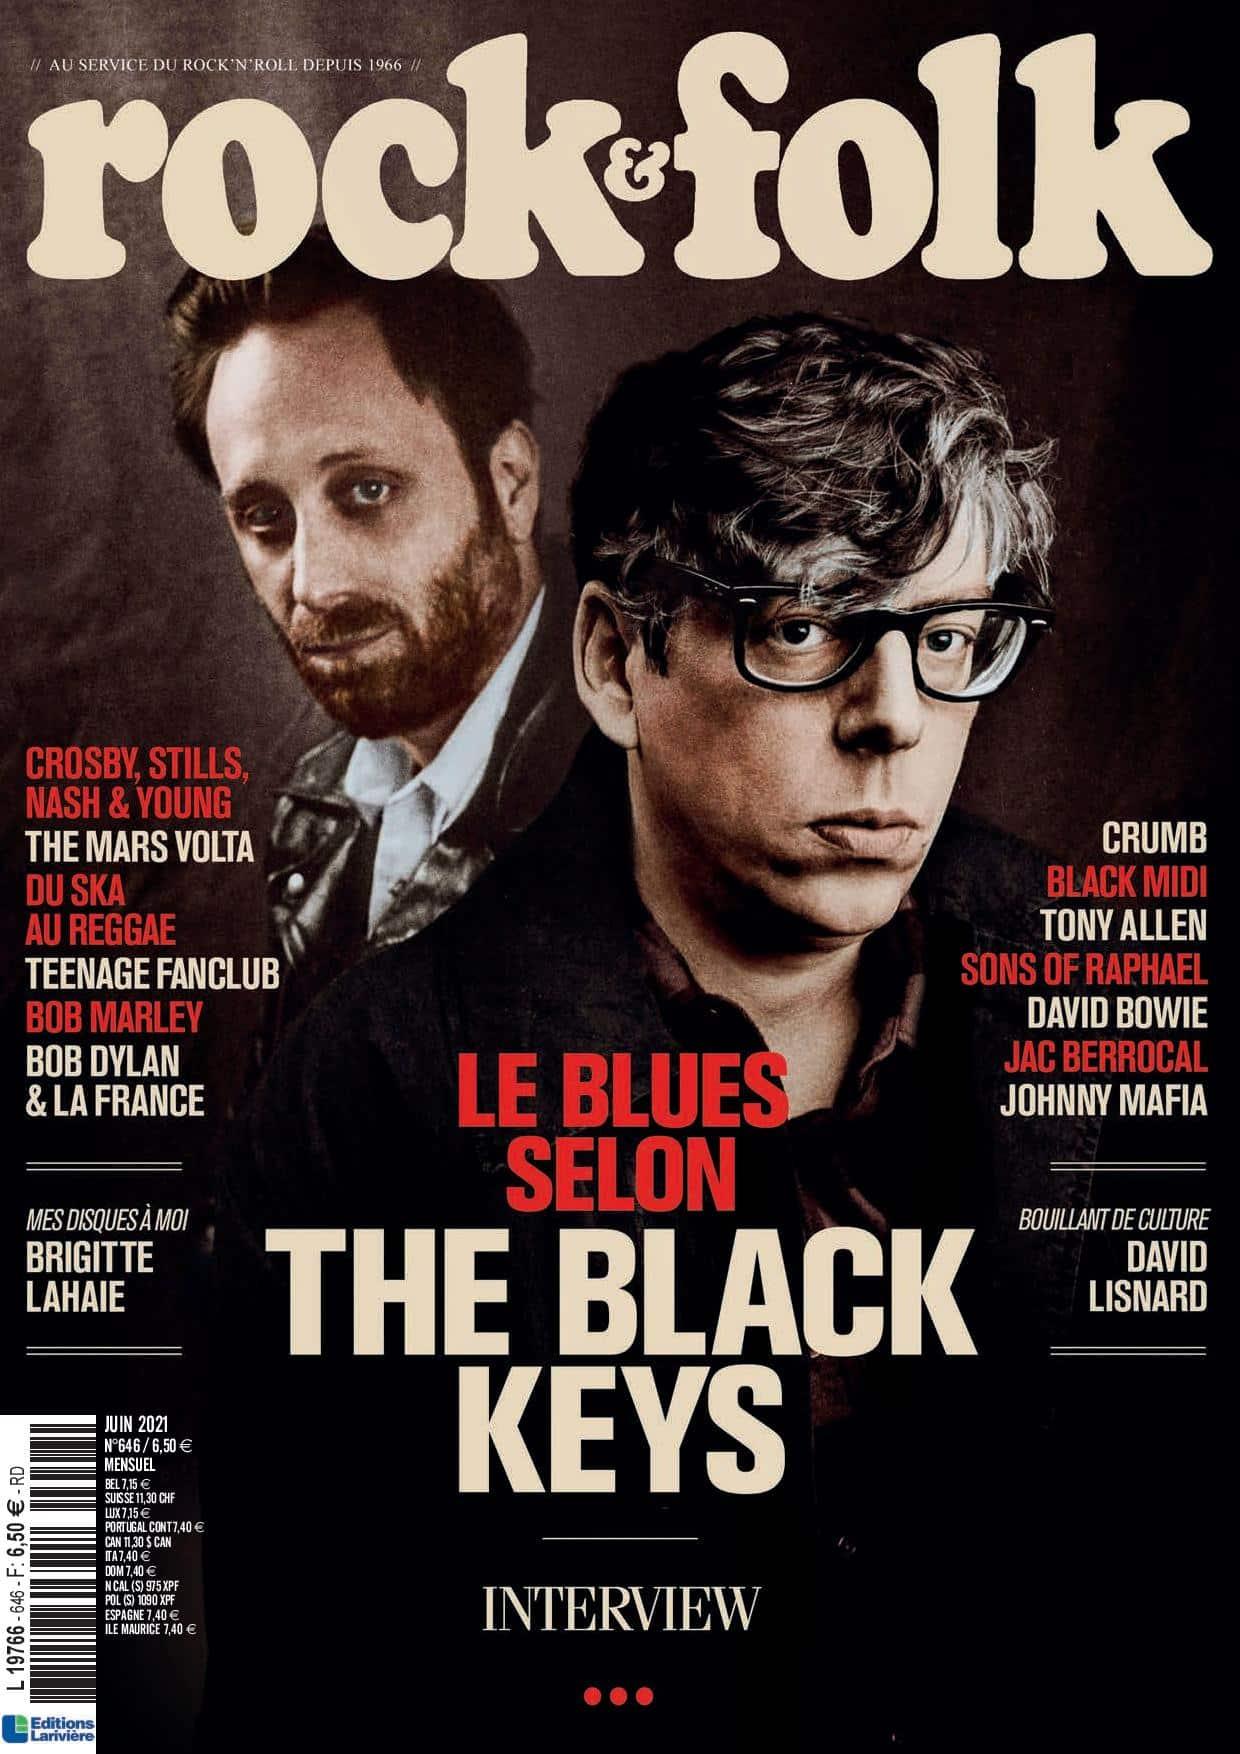 Rock&Folk 646 - The Black Keys